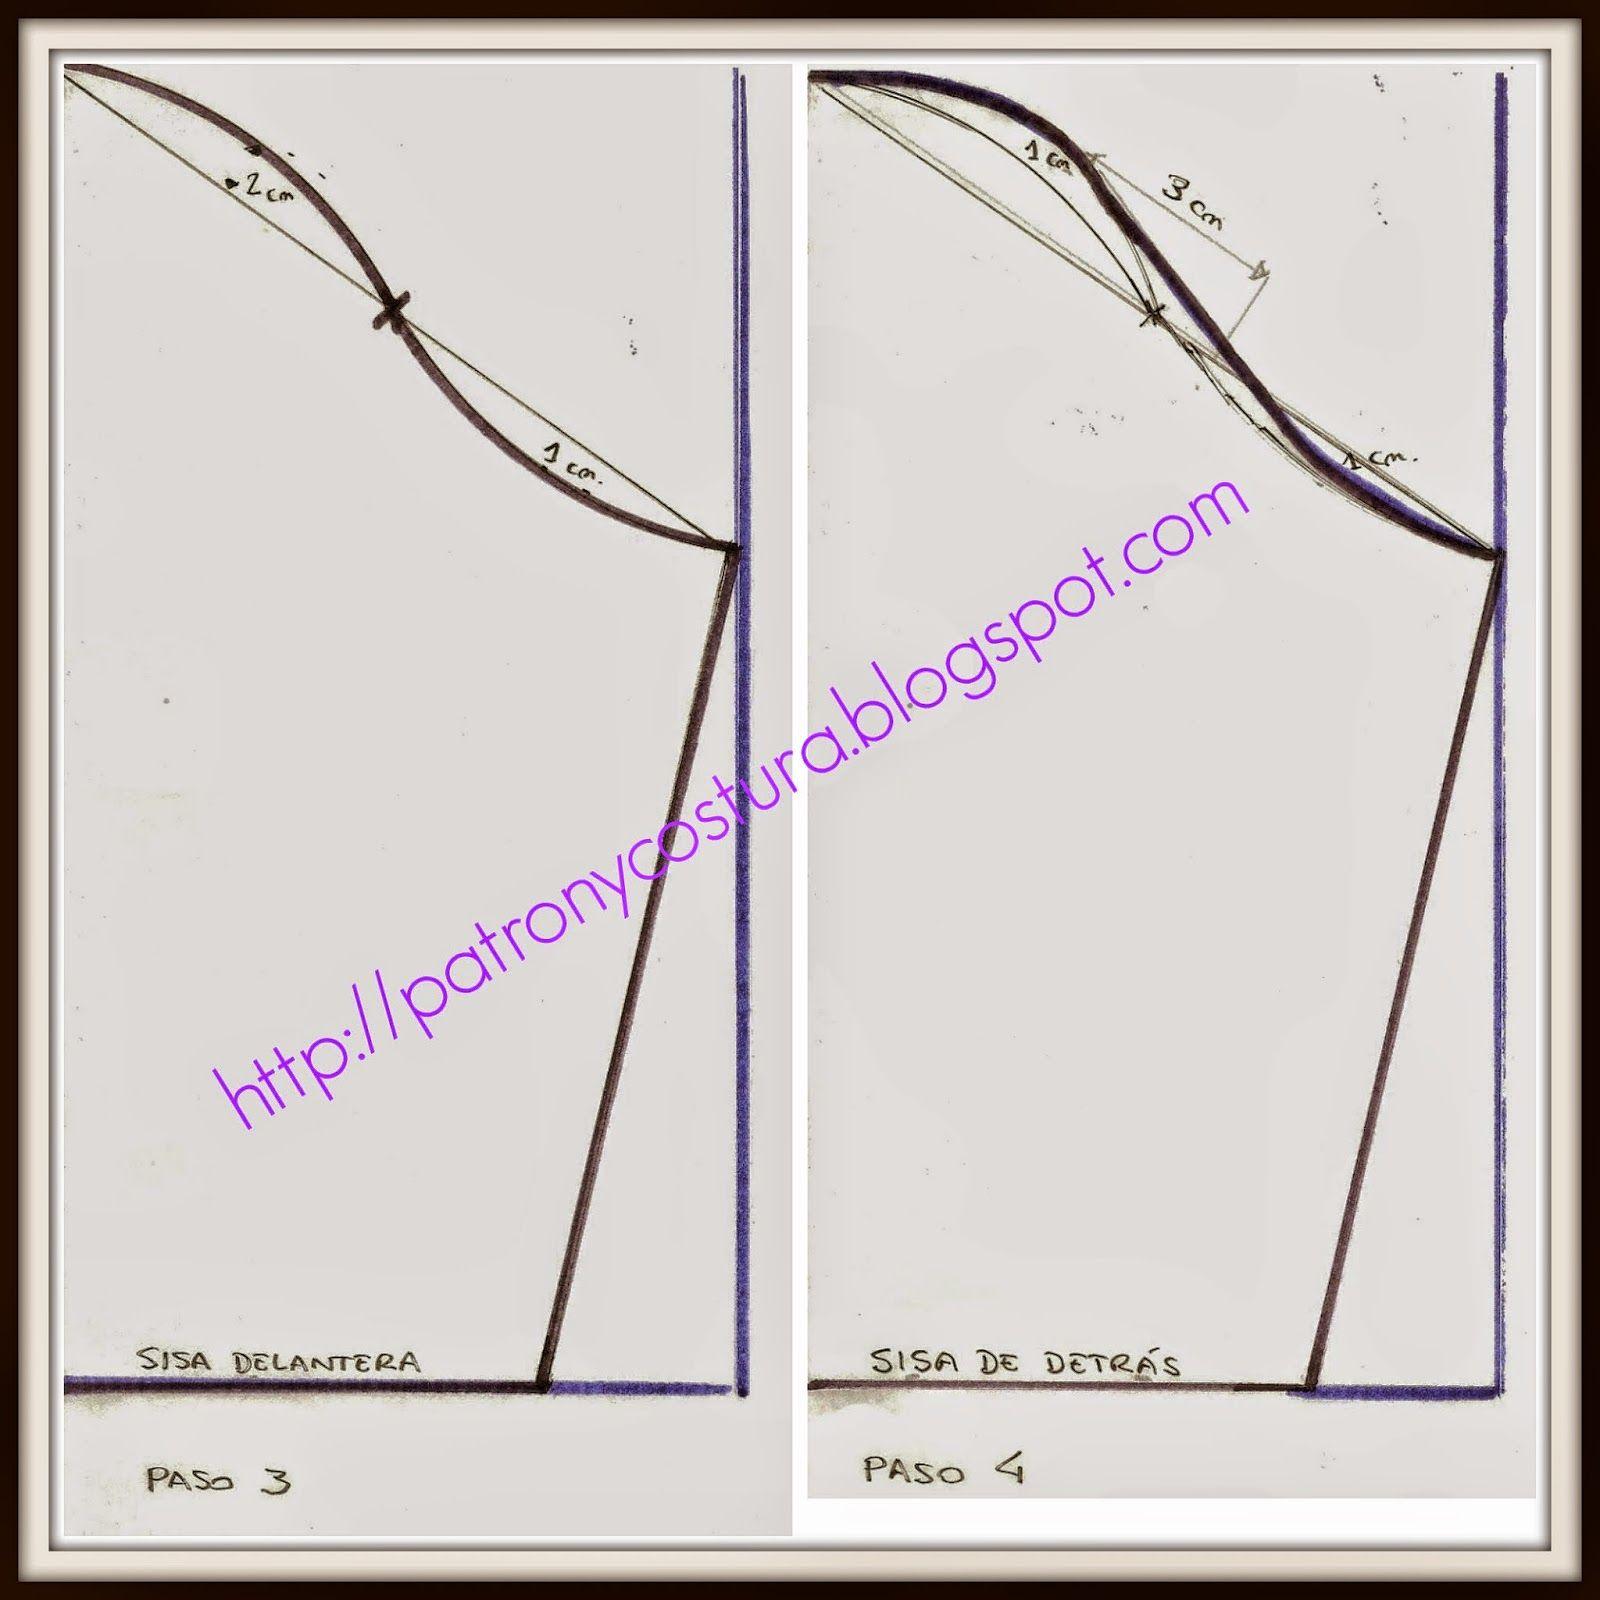 Pin de Rosa Nelly basombrio galvez en Patrones | Pinterest | Costura ...